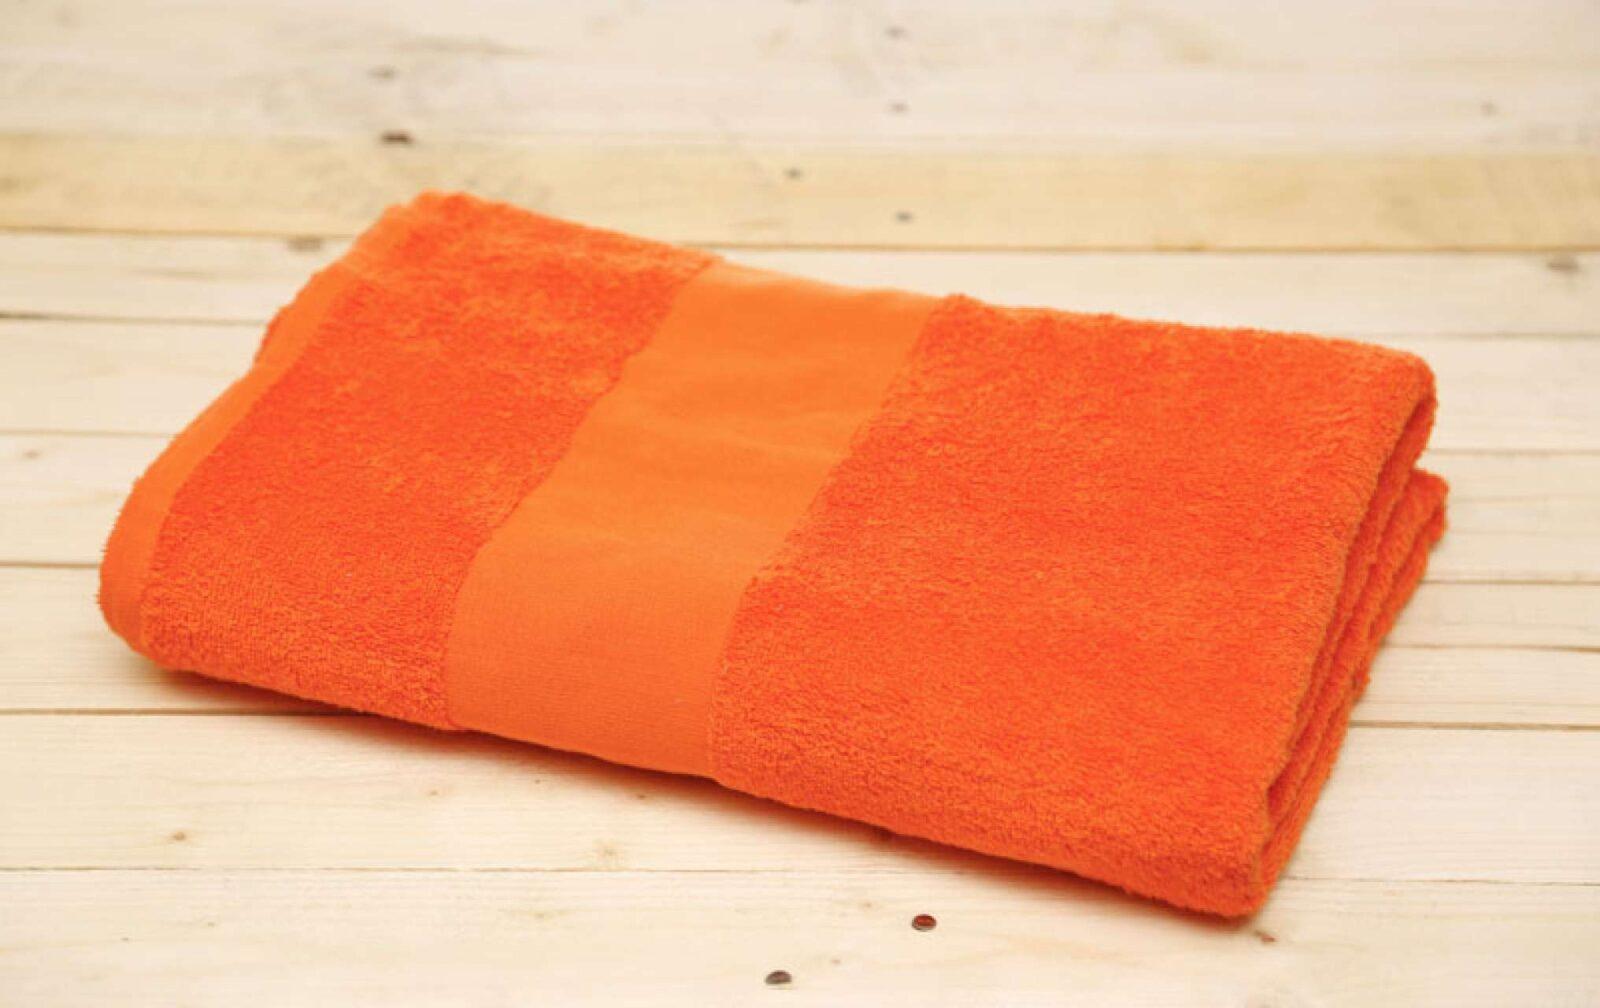 Prosop OL360 portocaliu orange Prosoape bumbac plaja baie bucatarie absorbante groase personalizate spa hotel broderie diverse dimensiuni